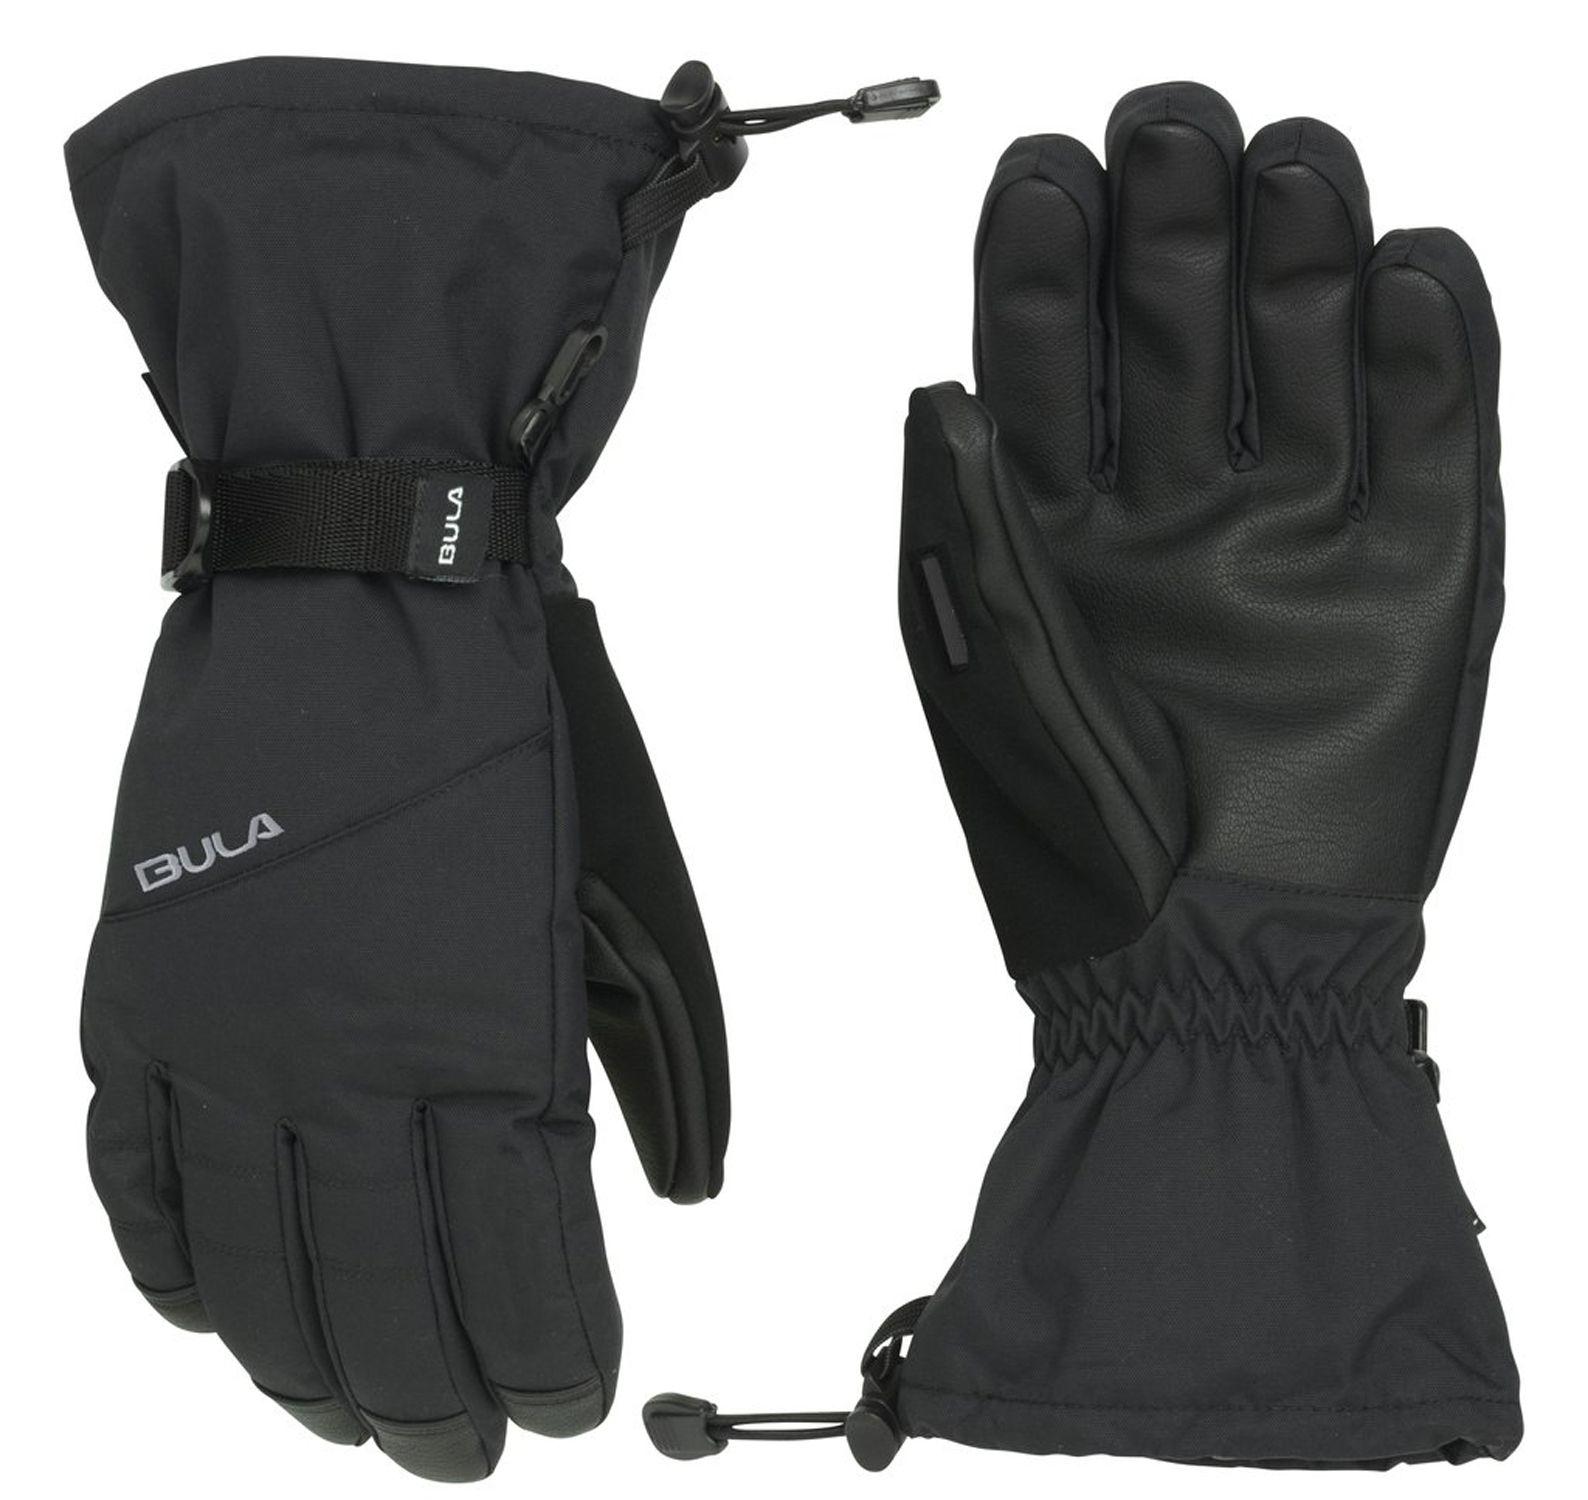 Coach Gloves, Black, L,  Bula